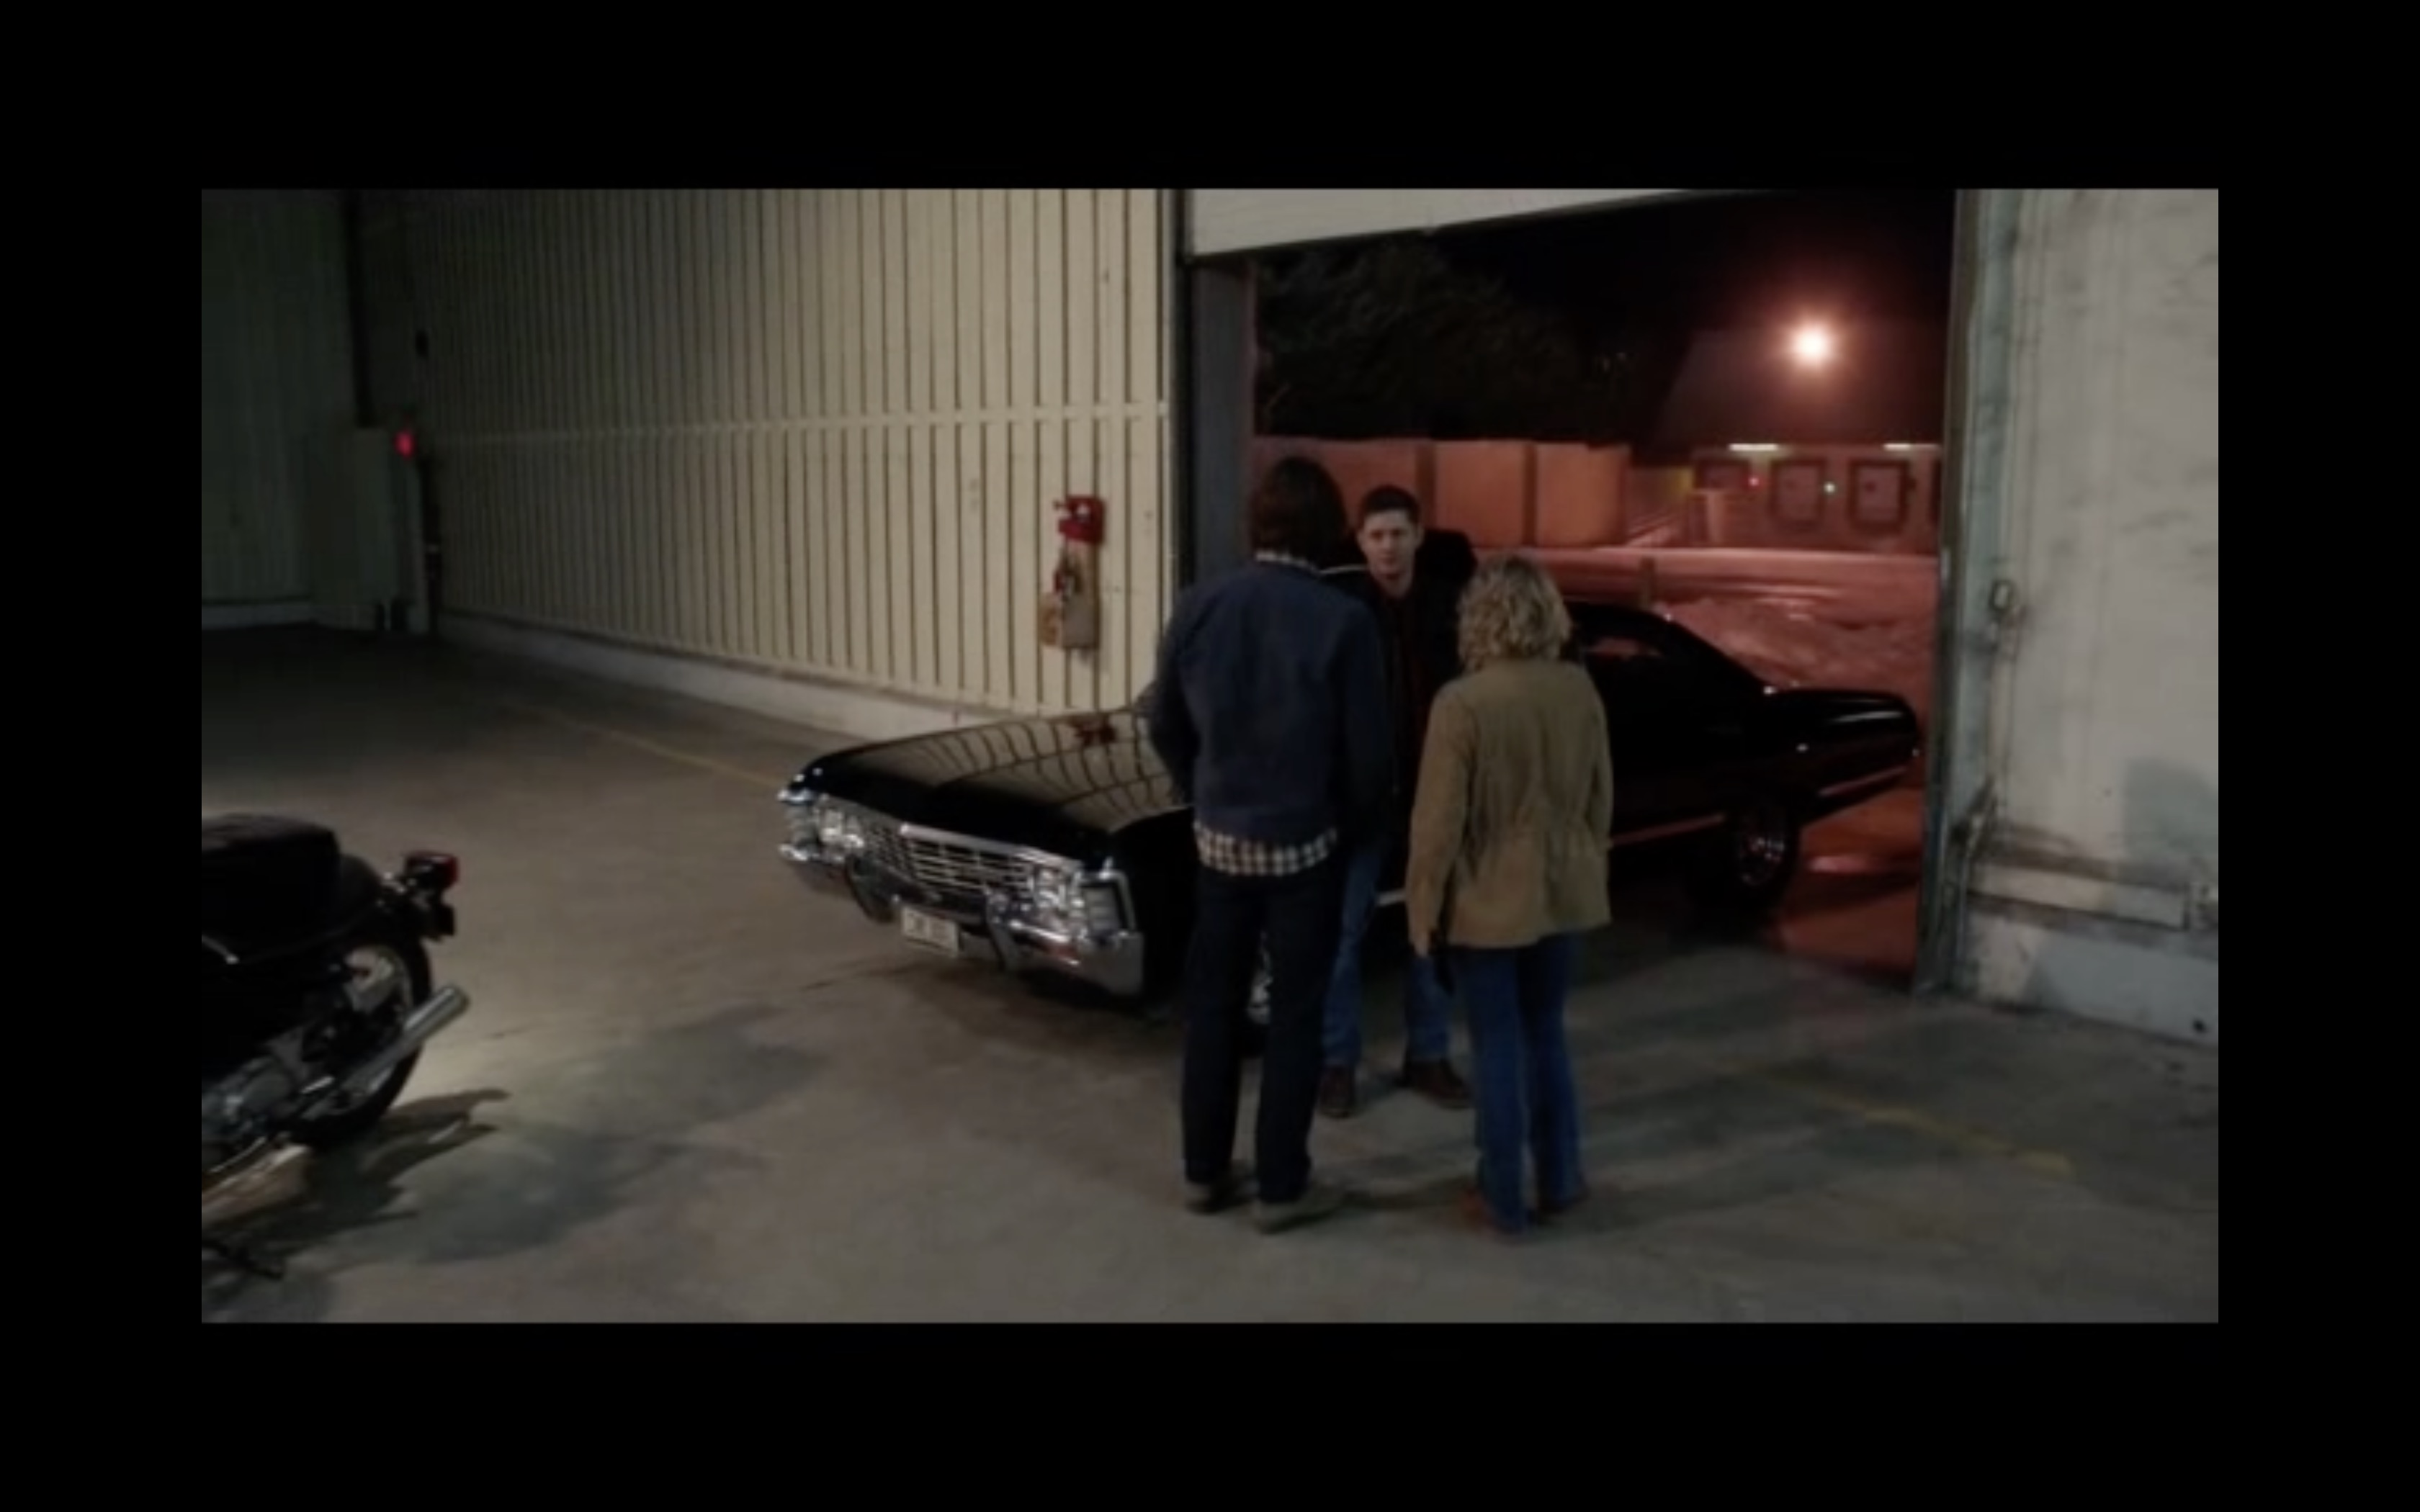 'Supernatural' keeps pushing emotional boundaries with The Raid 2017 images